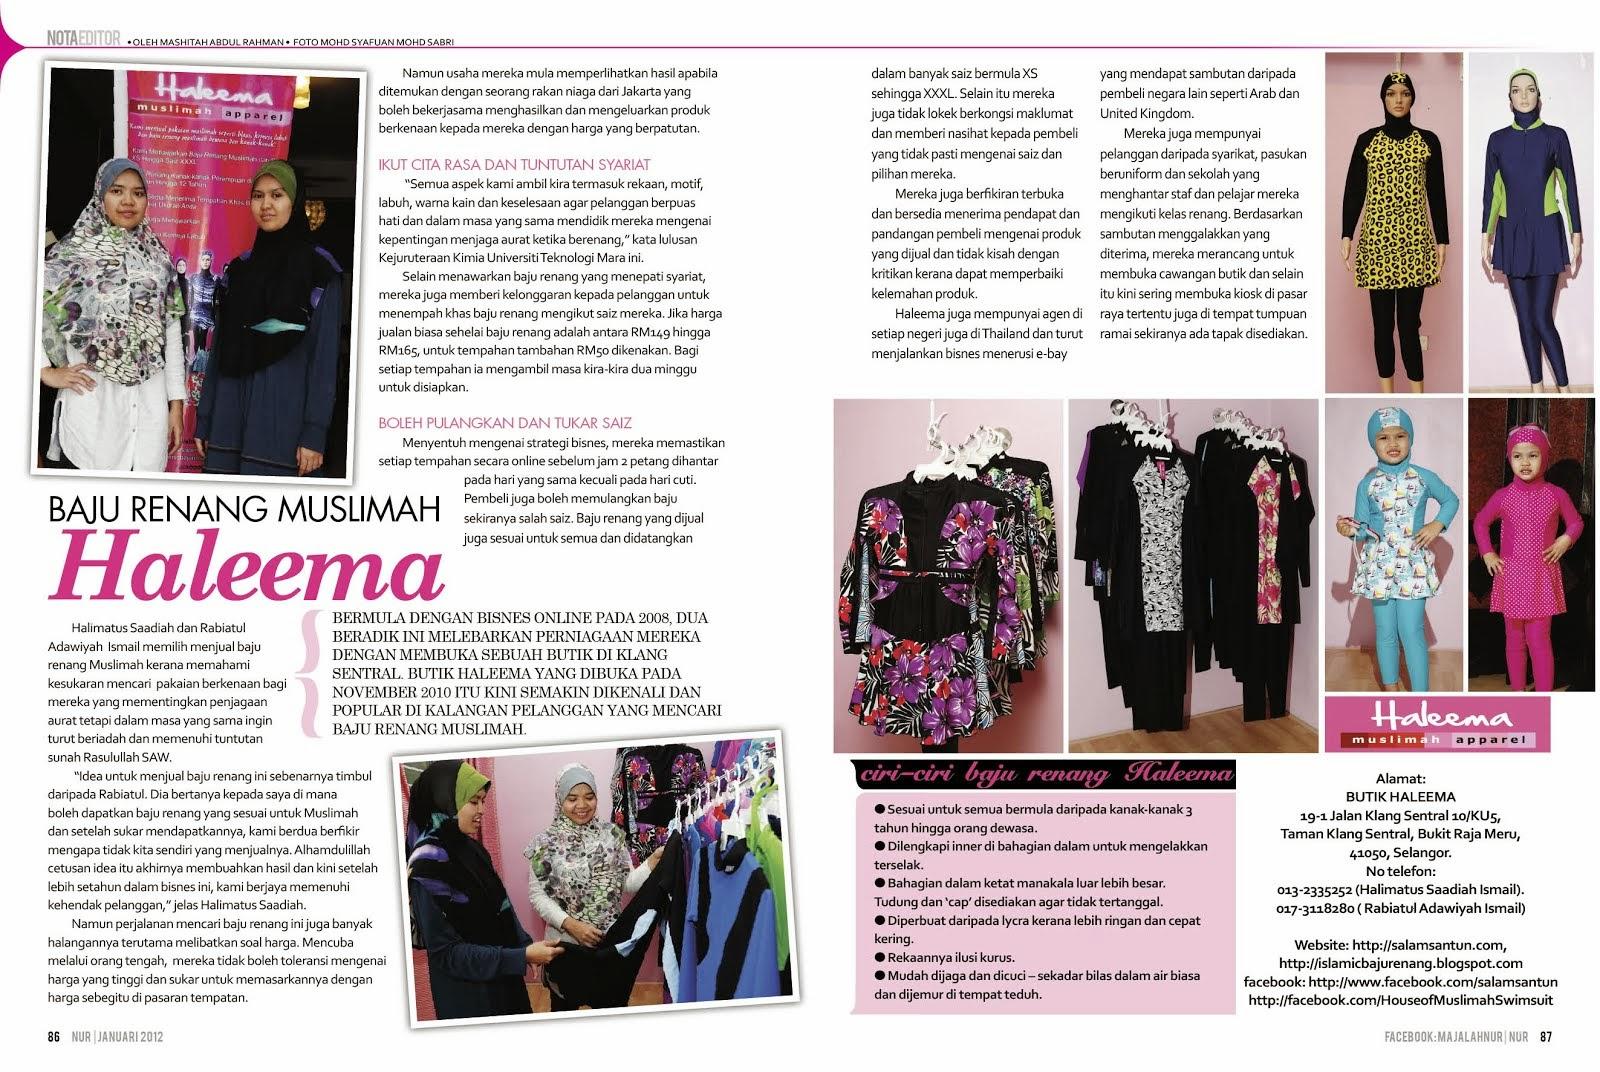 Haleema dalam Majalah Nur